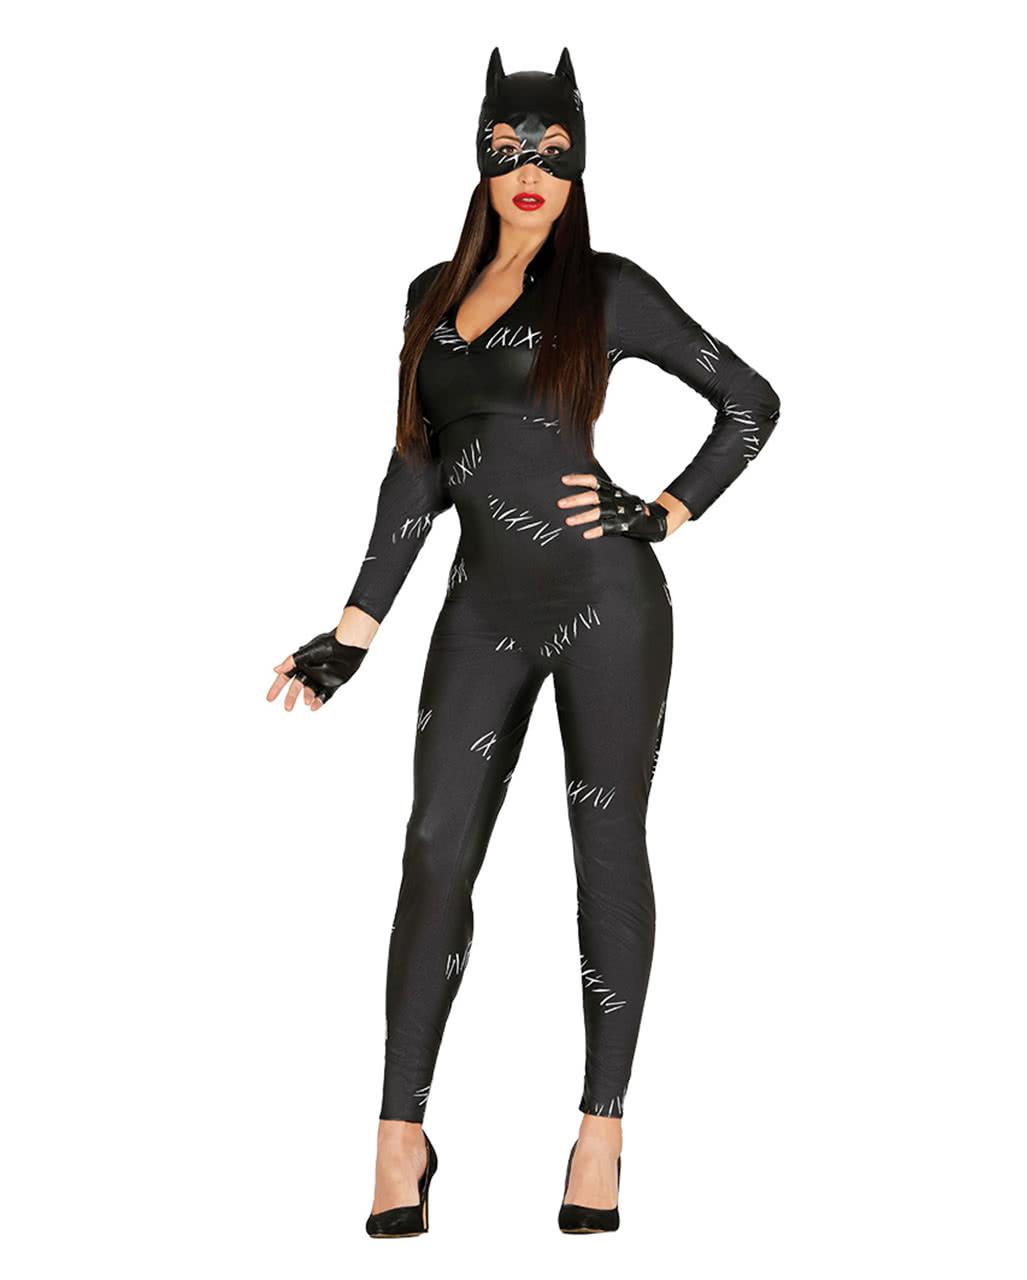 sexy cat jumpsuit women 39 s costume catsuit for halloween parties horror. Black Bedroom Furniture Sets. Home Design Ideas